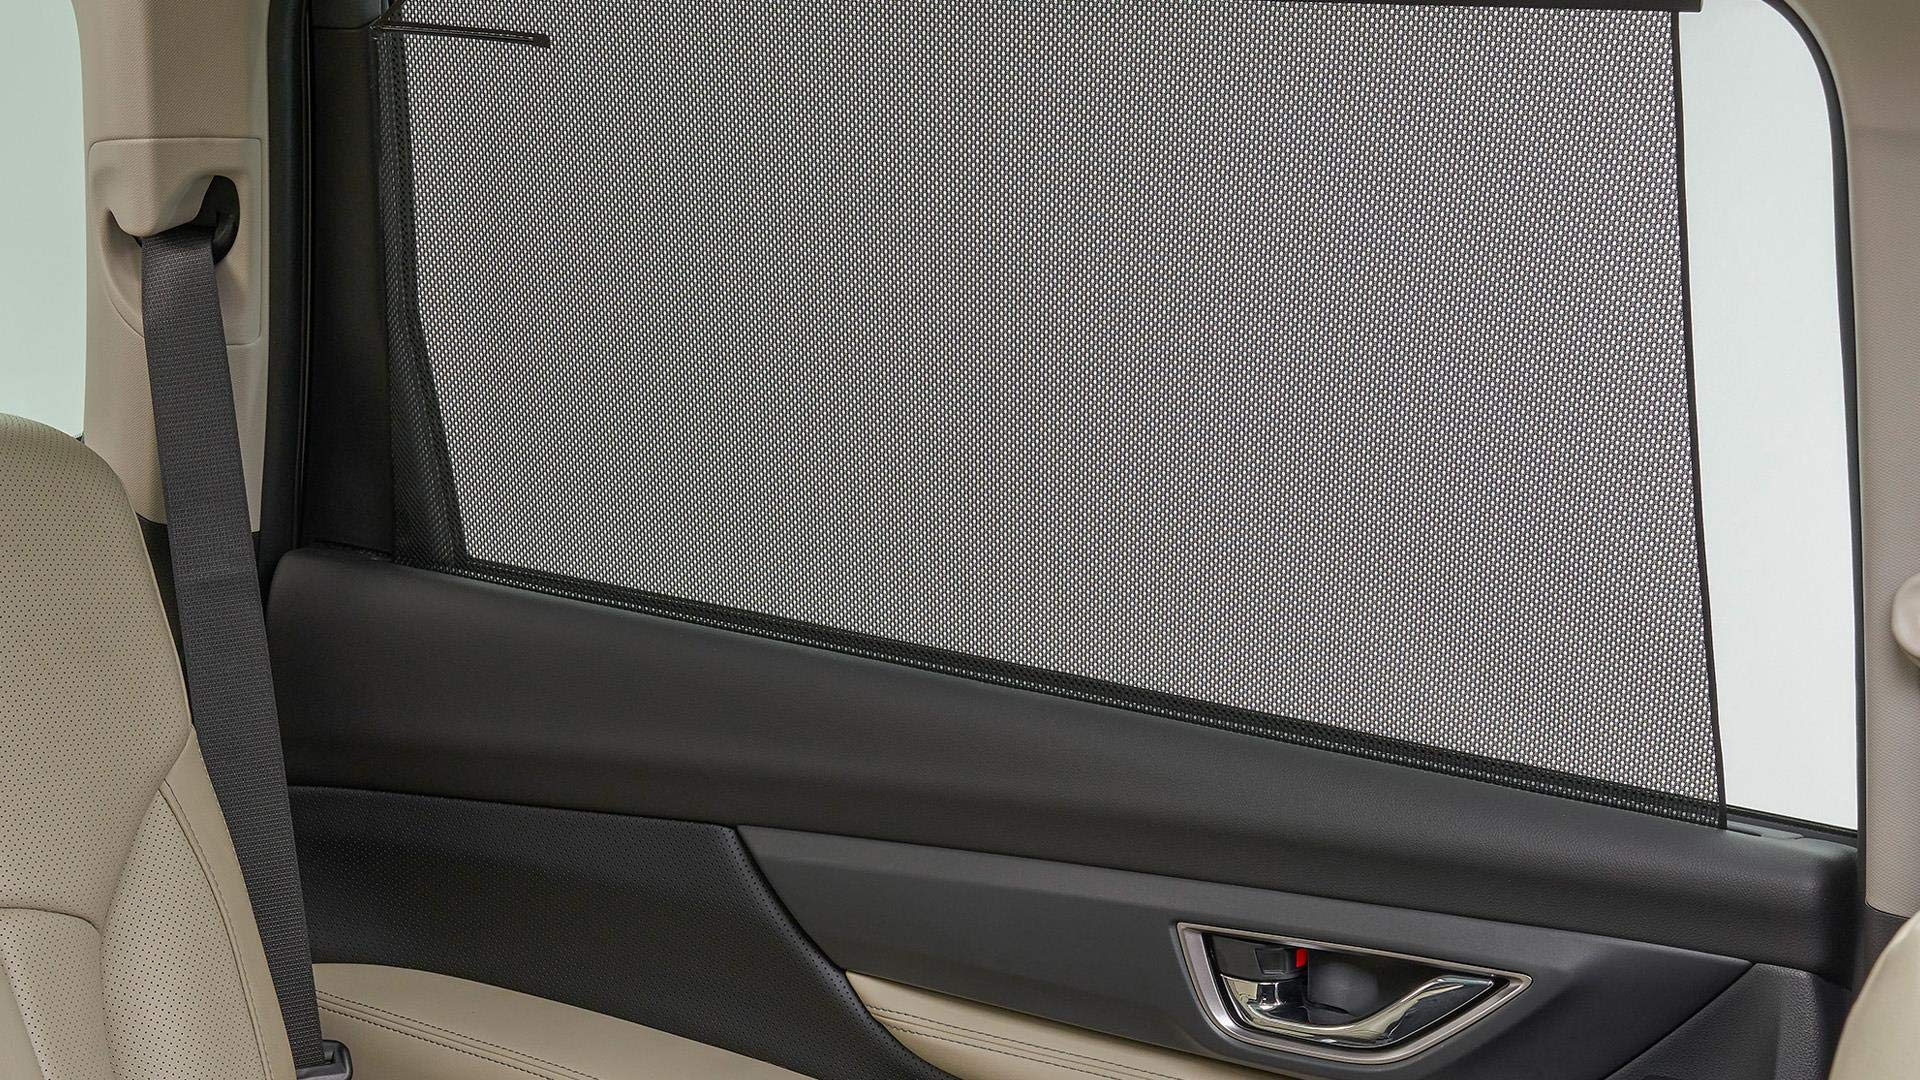 SUBARU 2019 Ascent 2nd Row Window Sunshade Set of Two New F501SXC000 Genuine by SUBARU (Image #1)